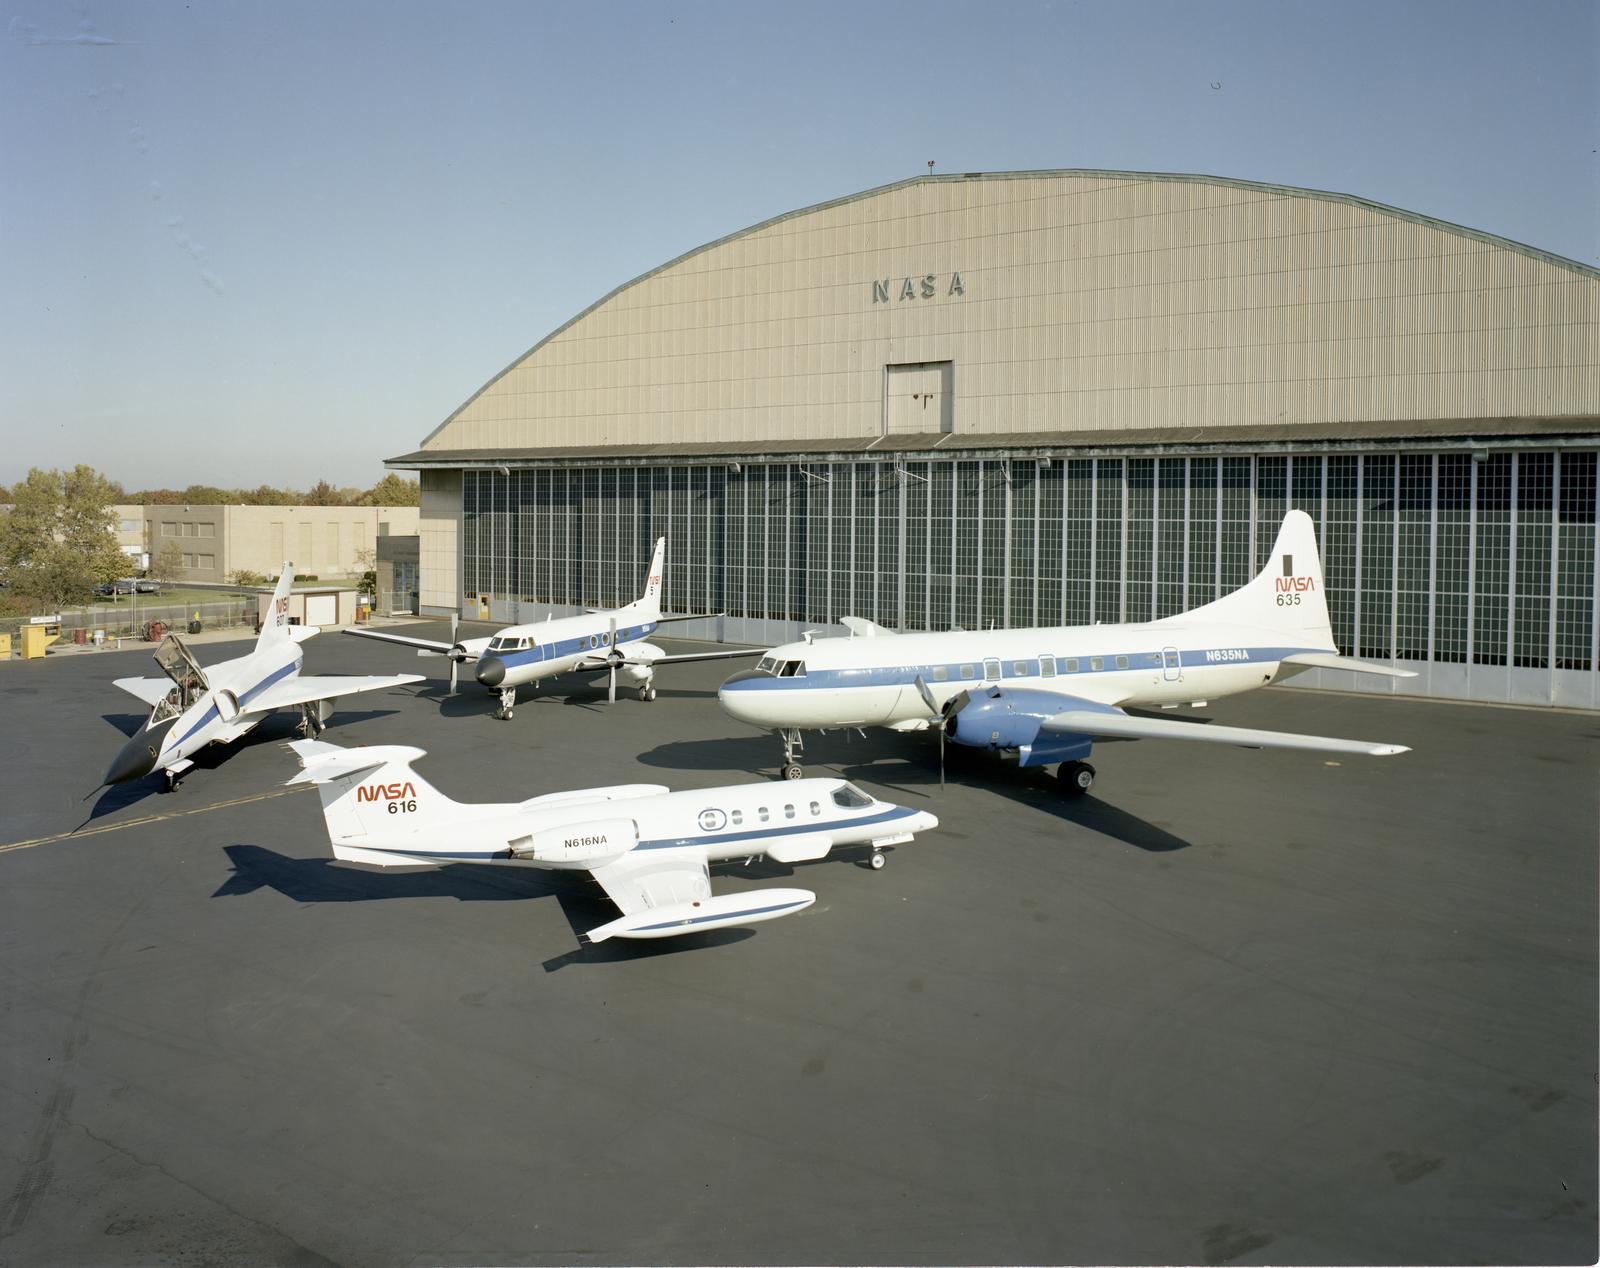 LEAR JET - G-1 - C-131 - F-106 AIRCRAFT